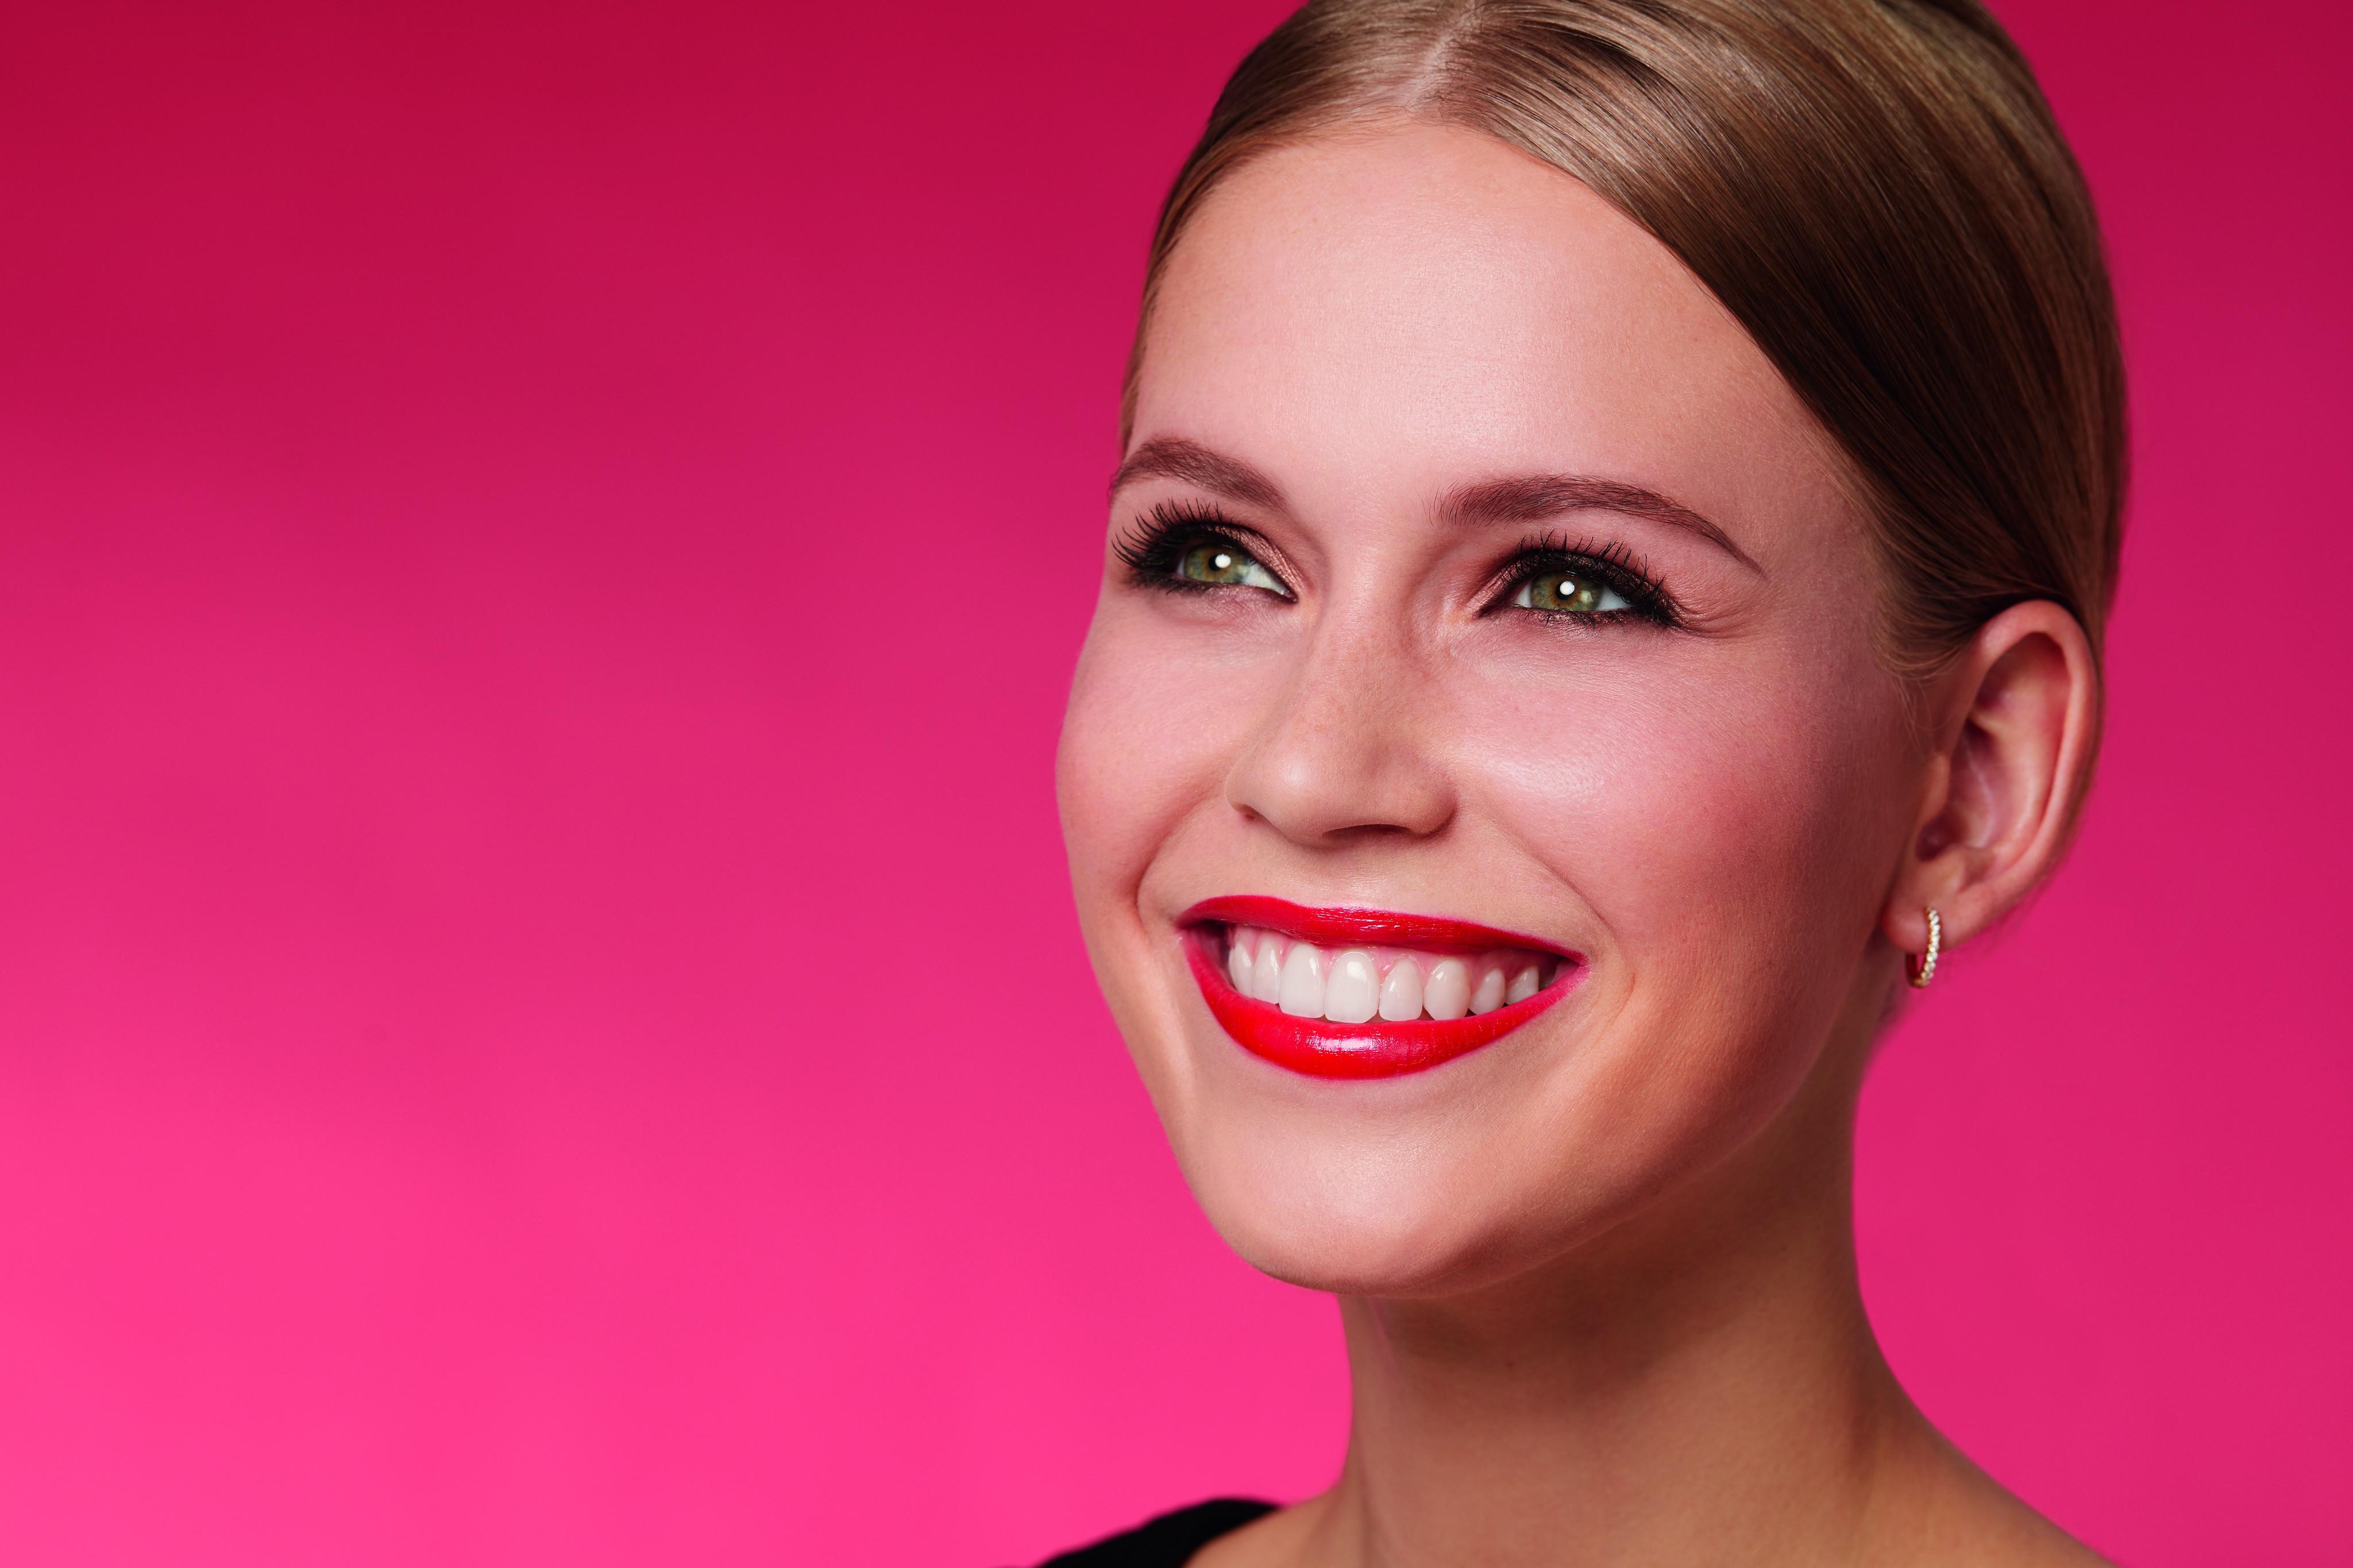 Douglas-collection-makeup-model-red-background-beauty-keyvisual-cmyk-Web-Renditionexe0LQp1U7Vw6